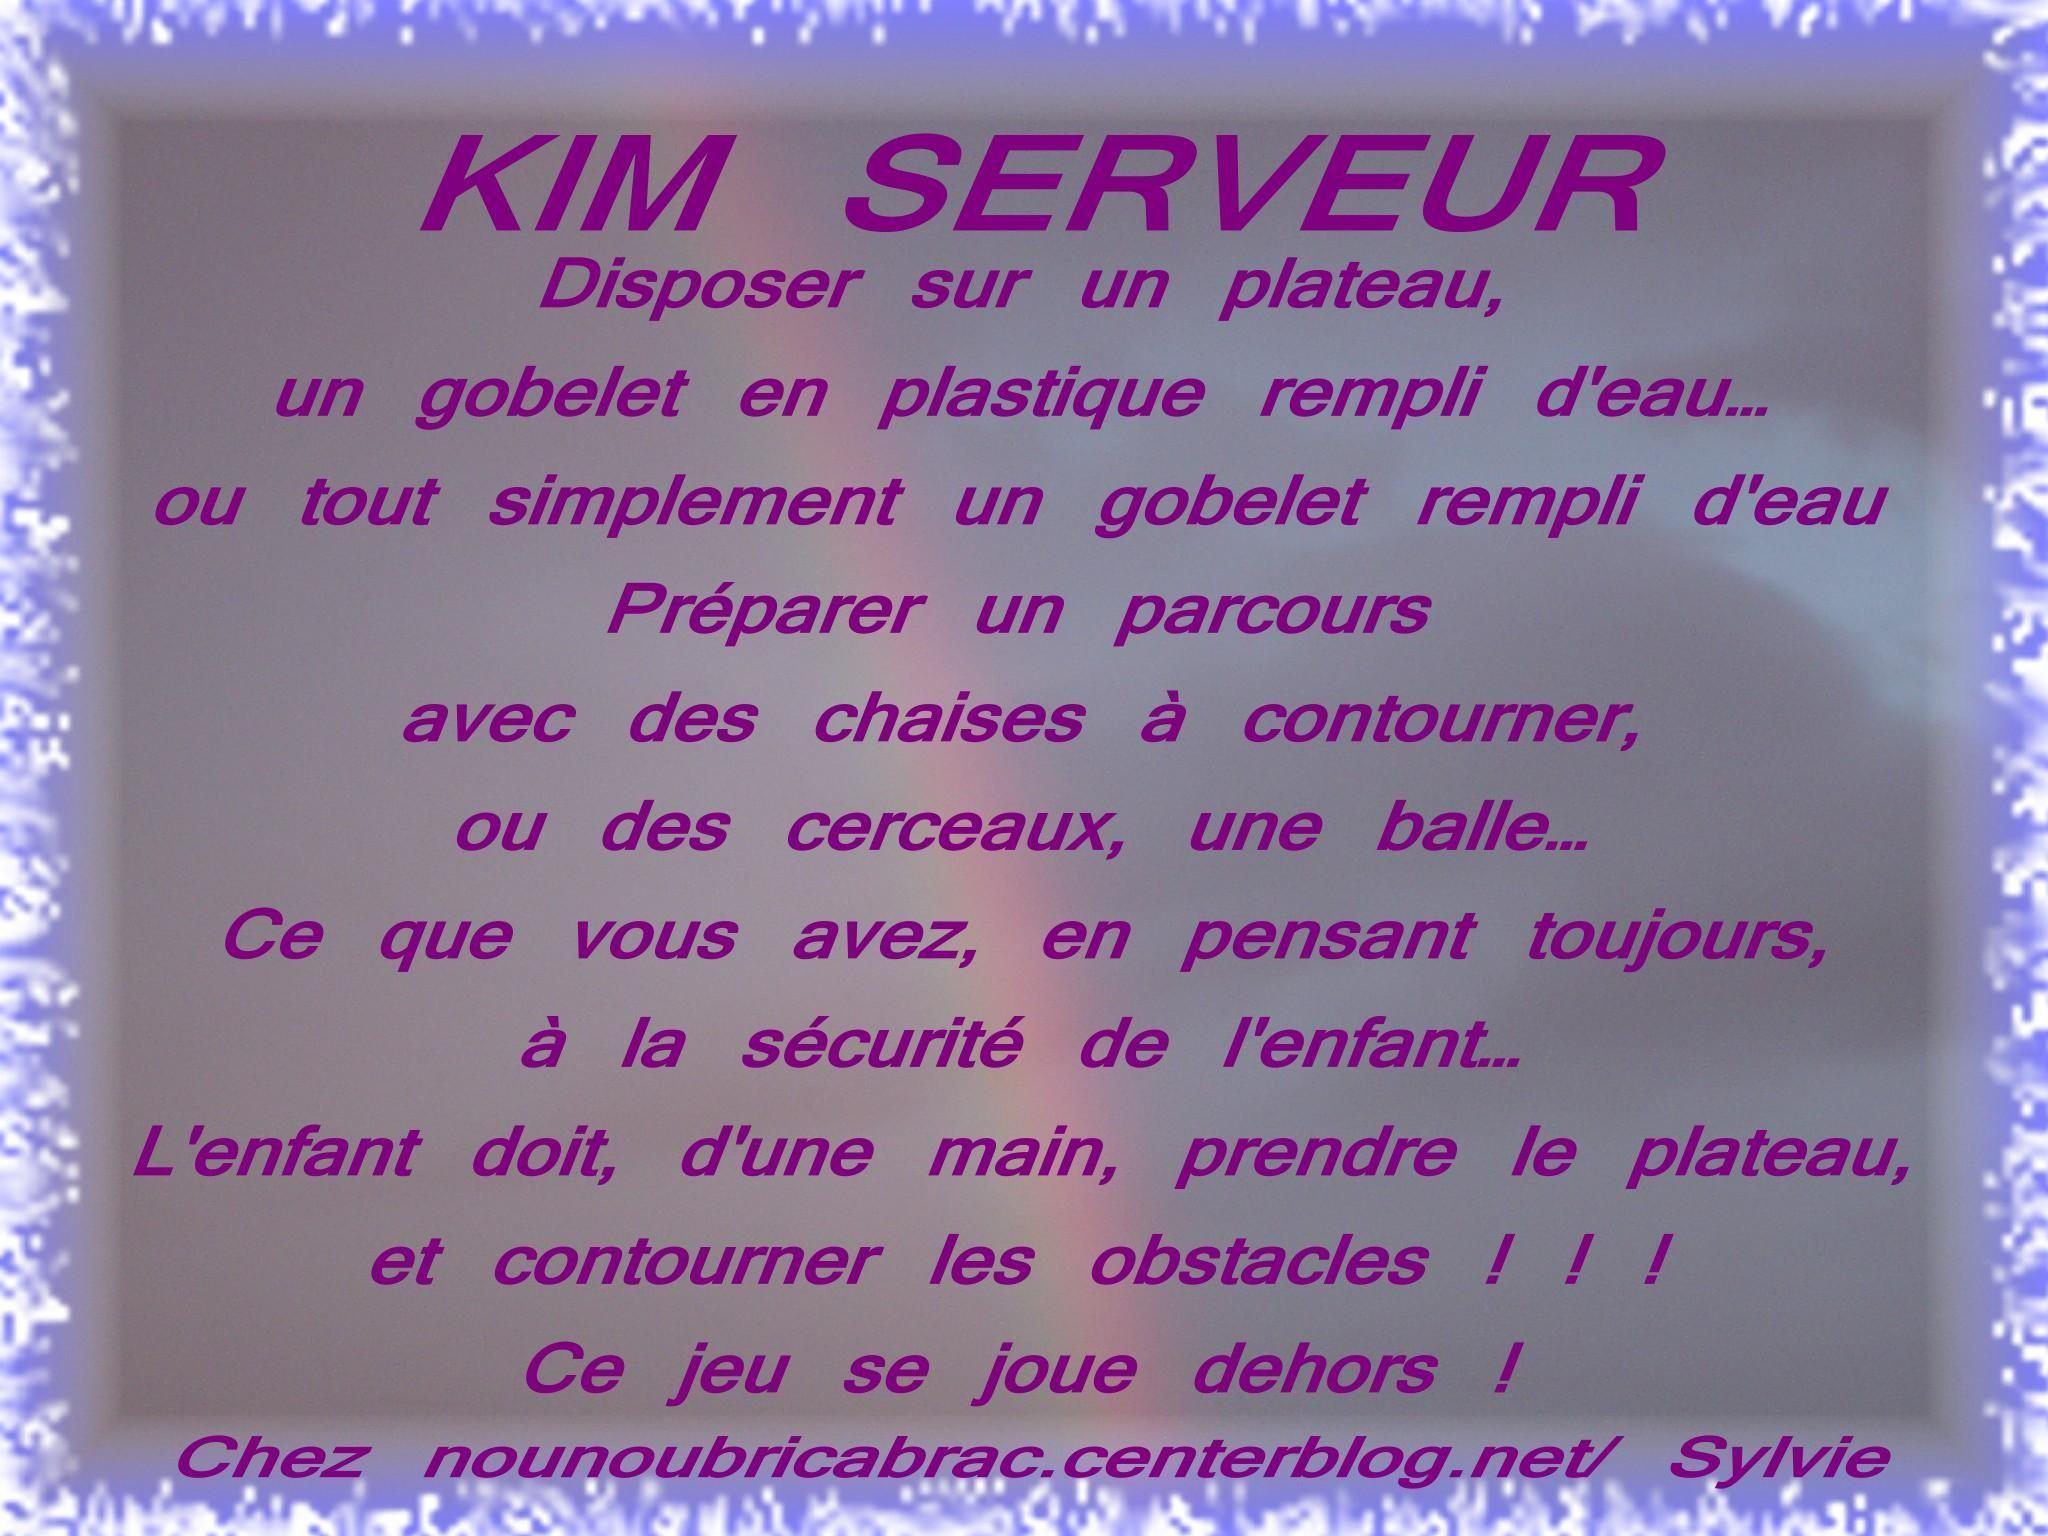 KIM SERVEUR